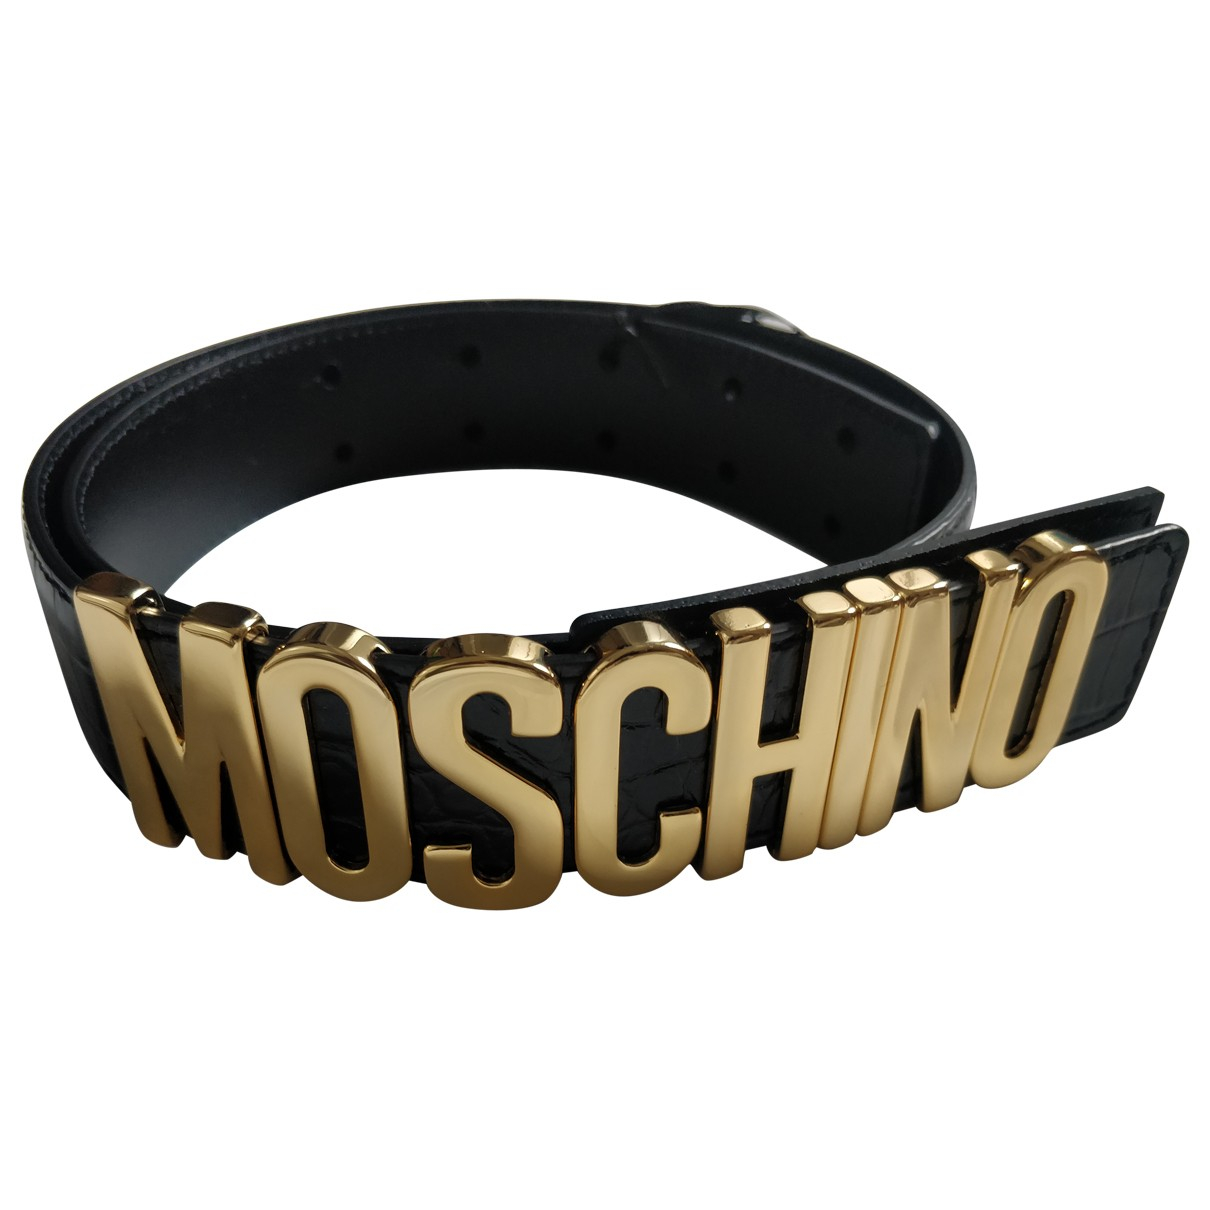 Moschino \N Black Leather belt for Women 75 cm